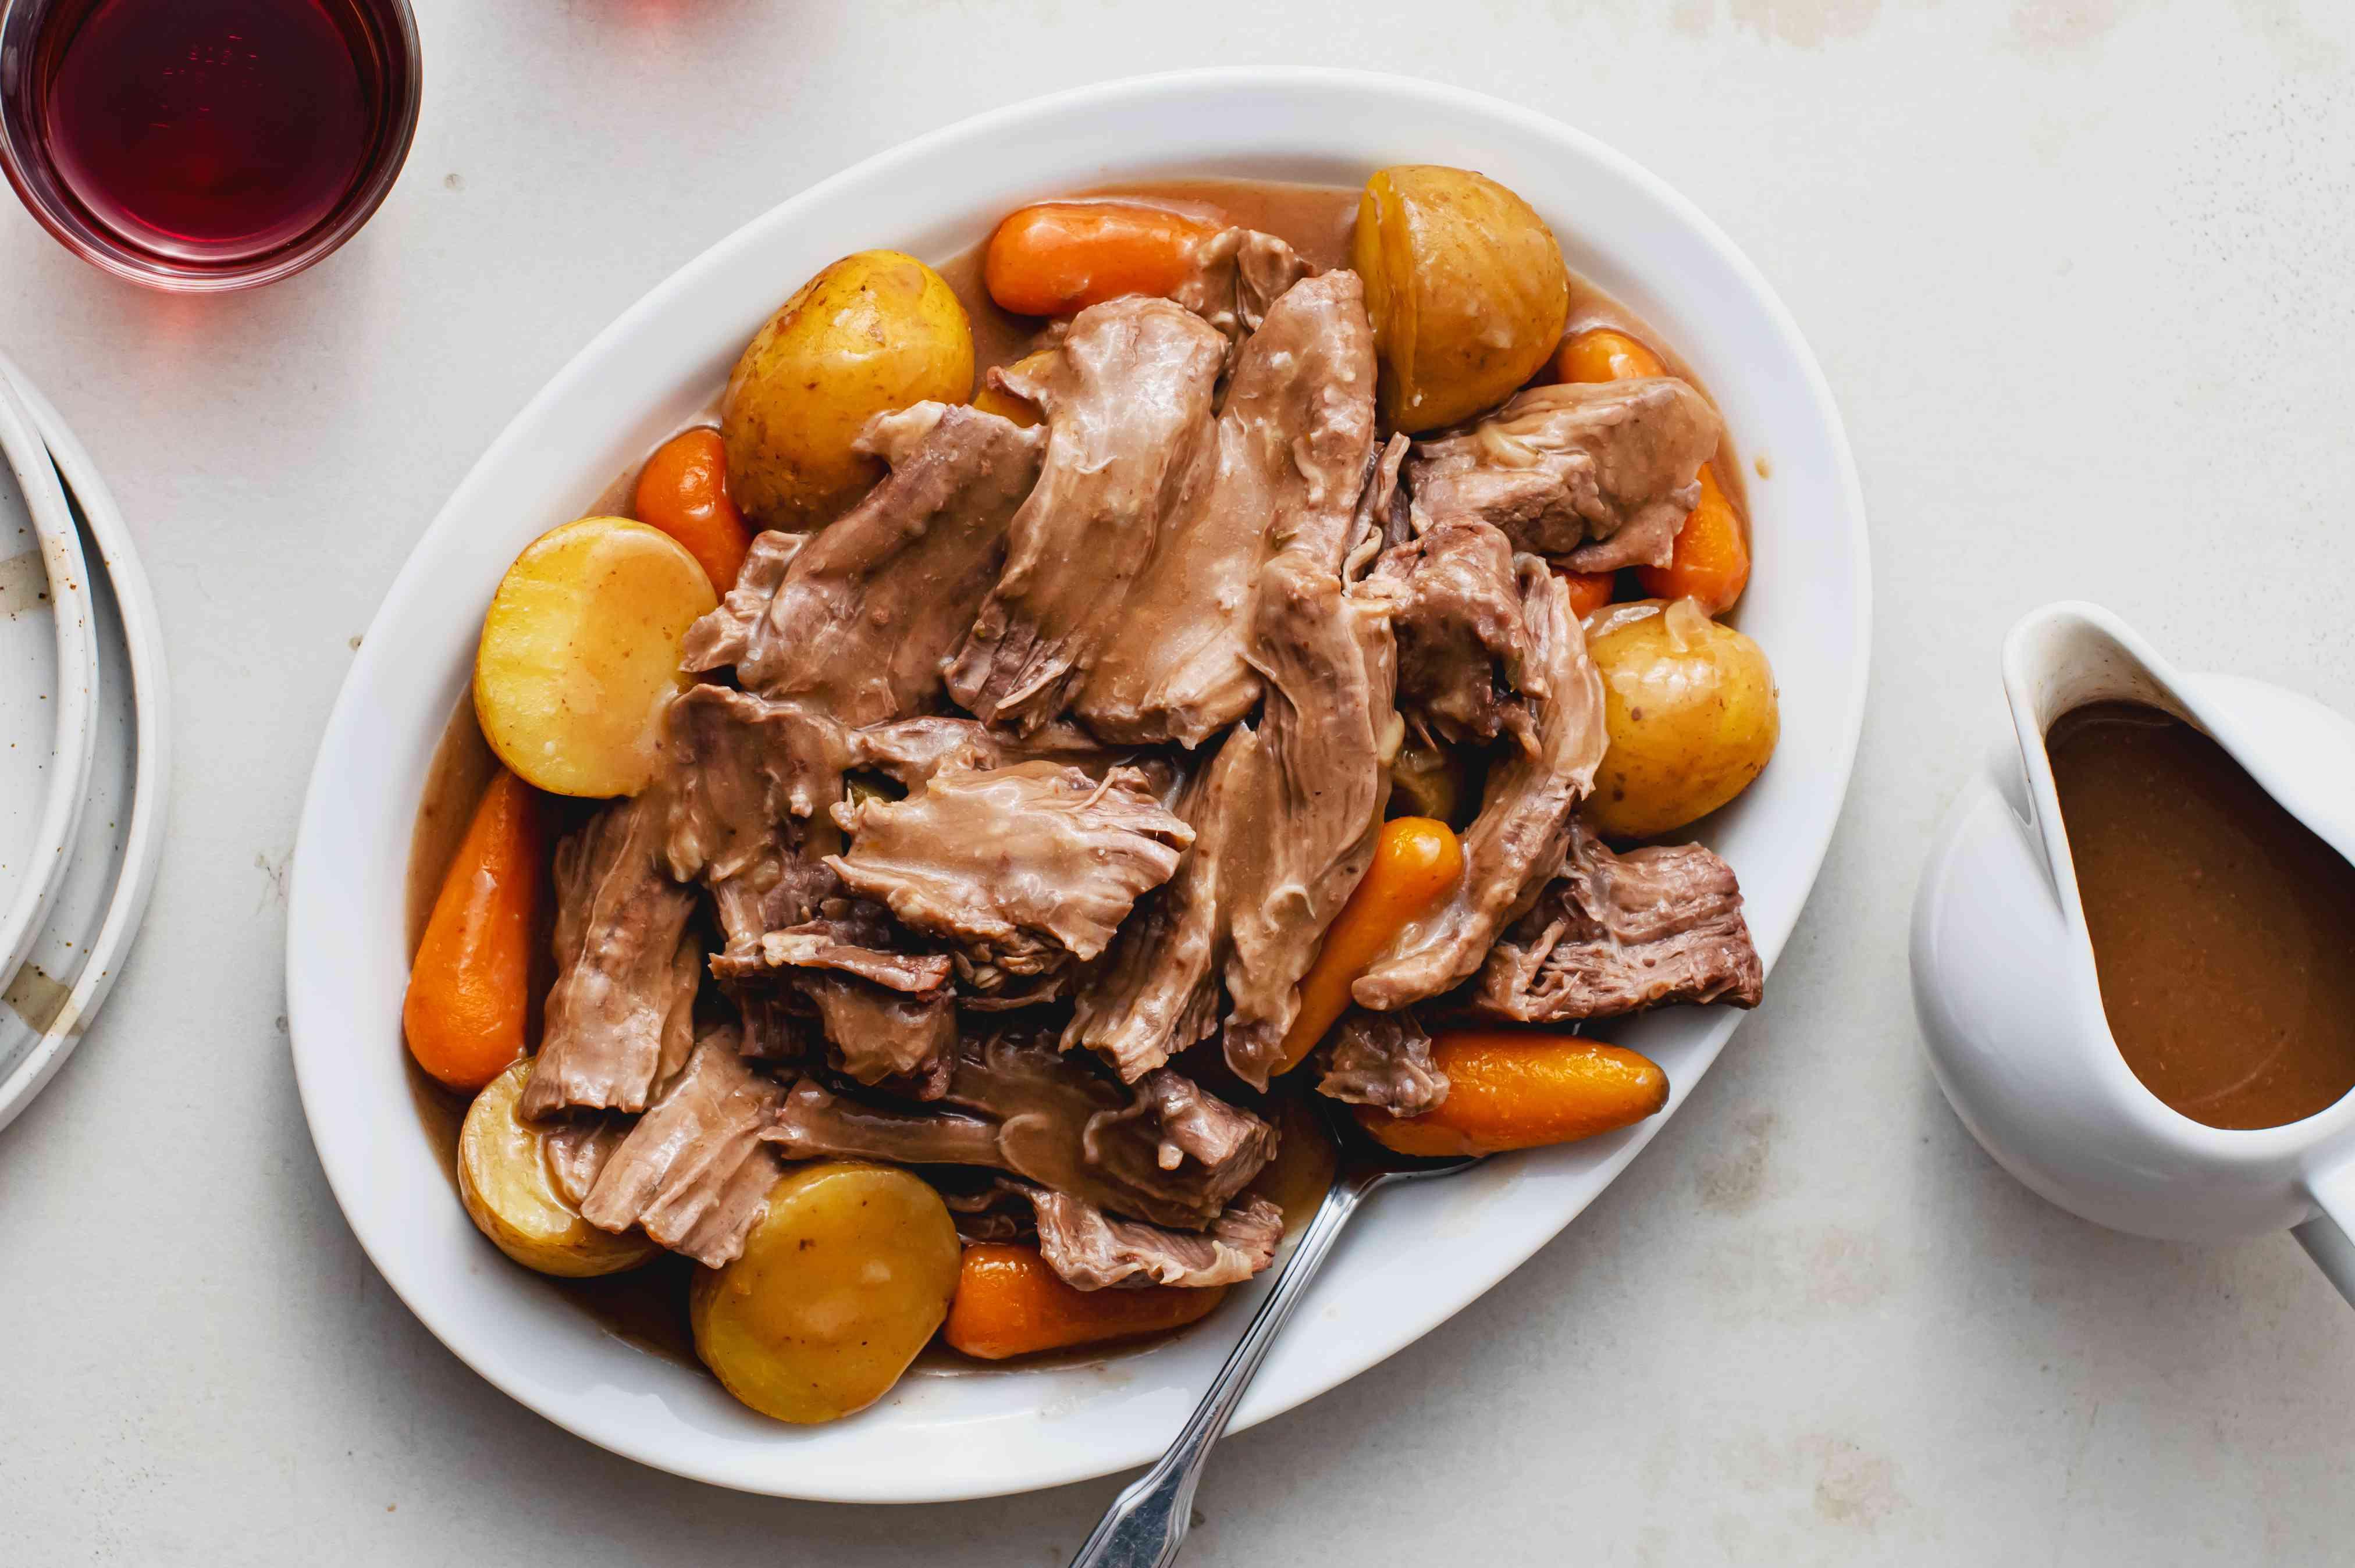 Crock Pot Onion Soup Beef Pot Roast recipe, on a white plate